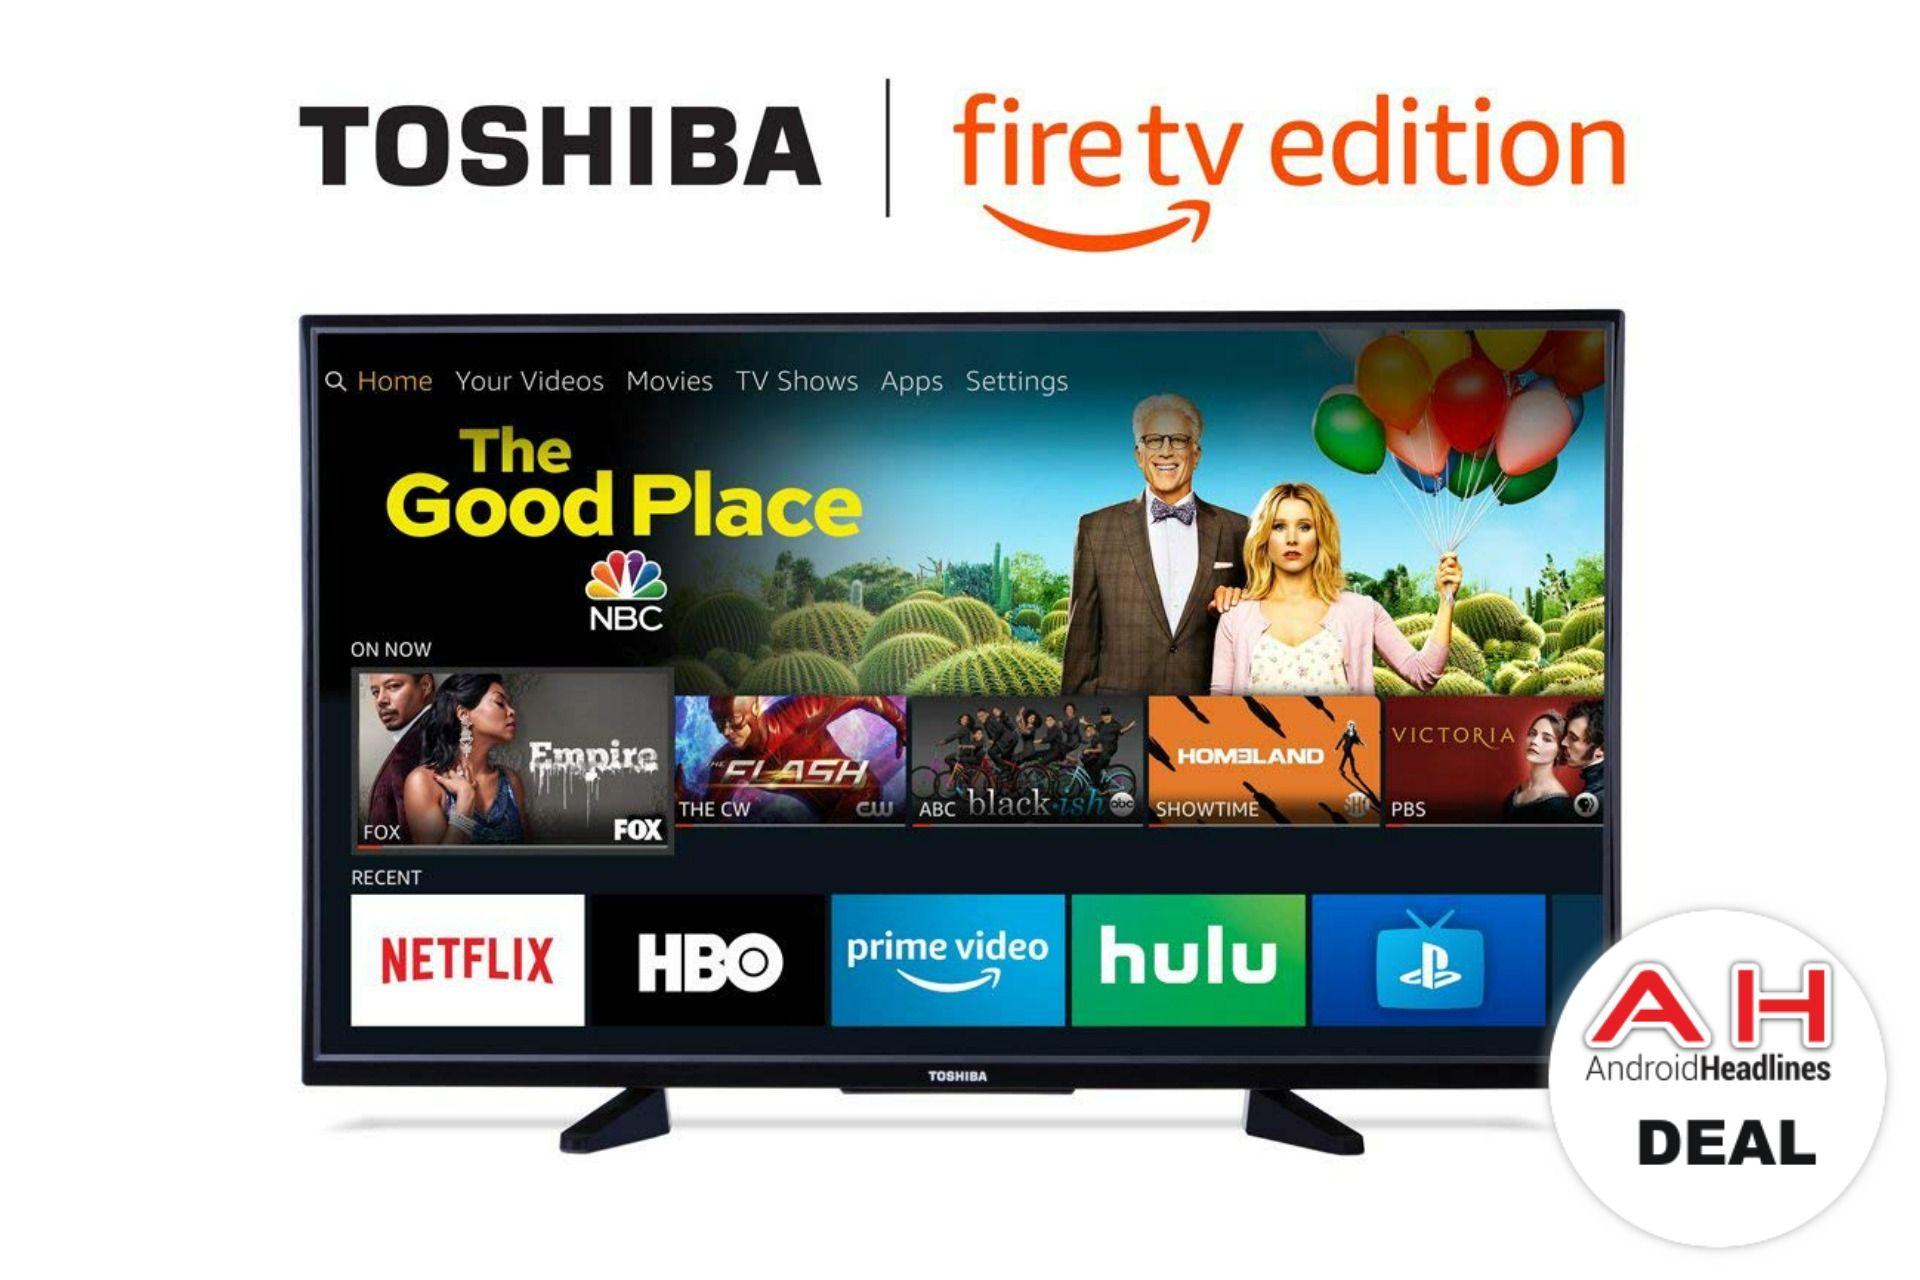 Deal Fire Tv Edition Toshiba 43 Inch 4k Ultra Hd Tv 249 99